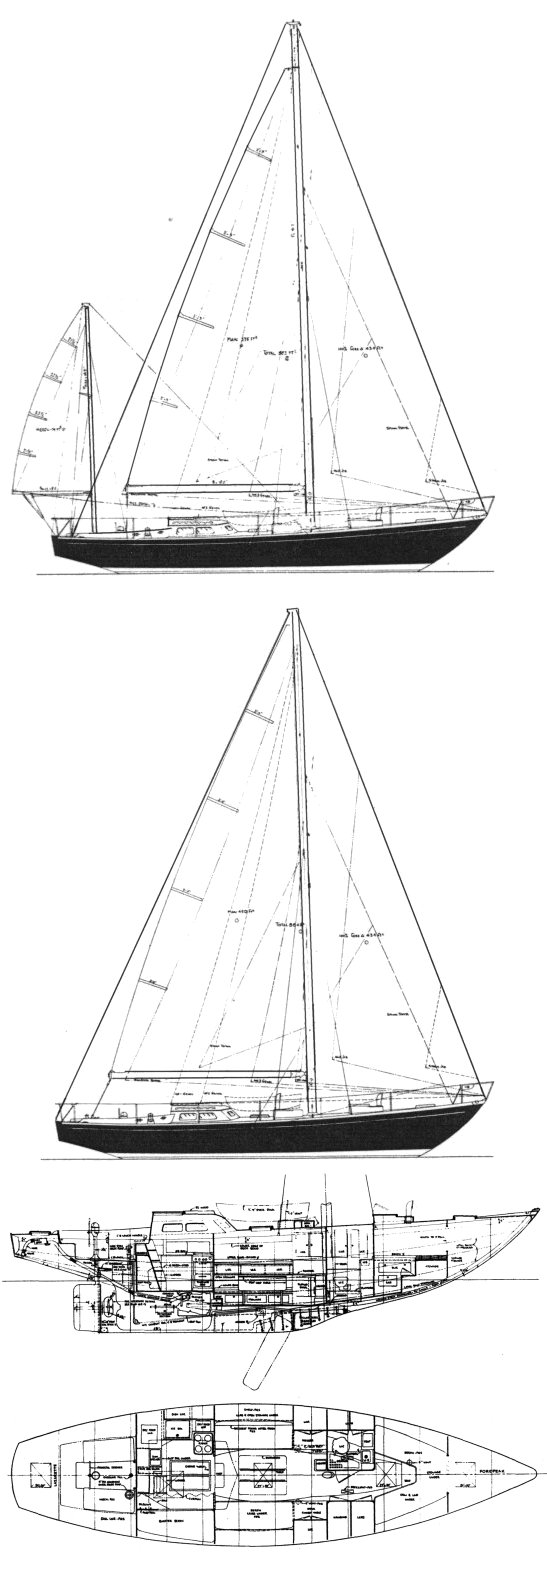 MERCER 44 drawing